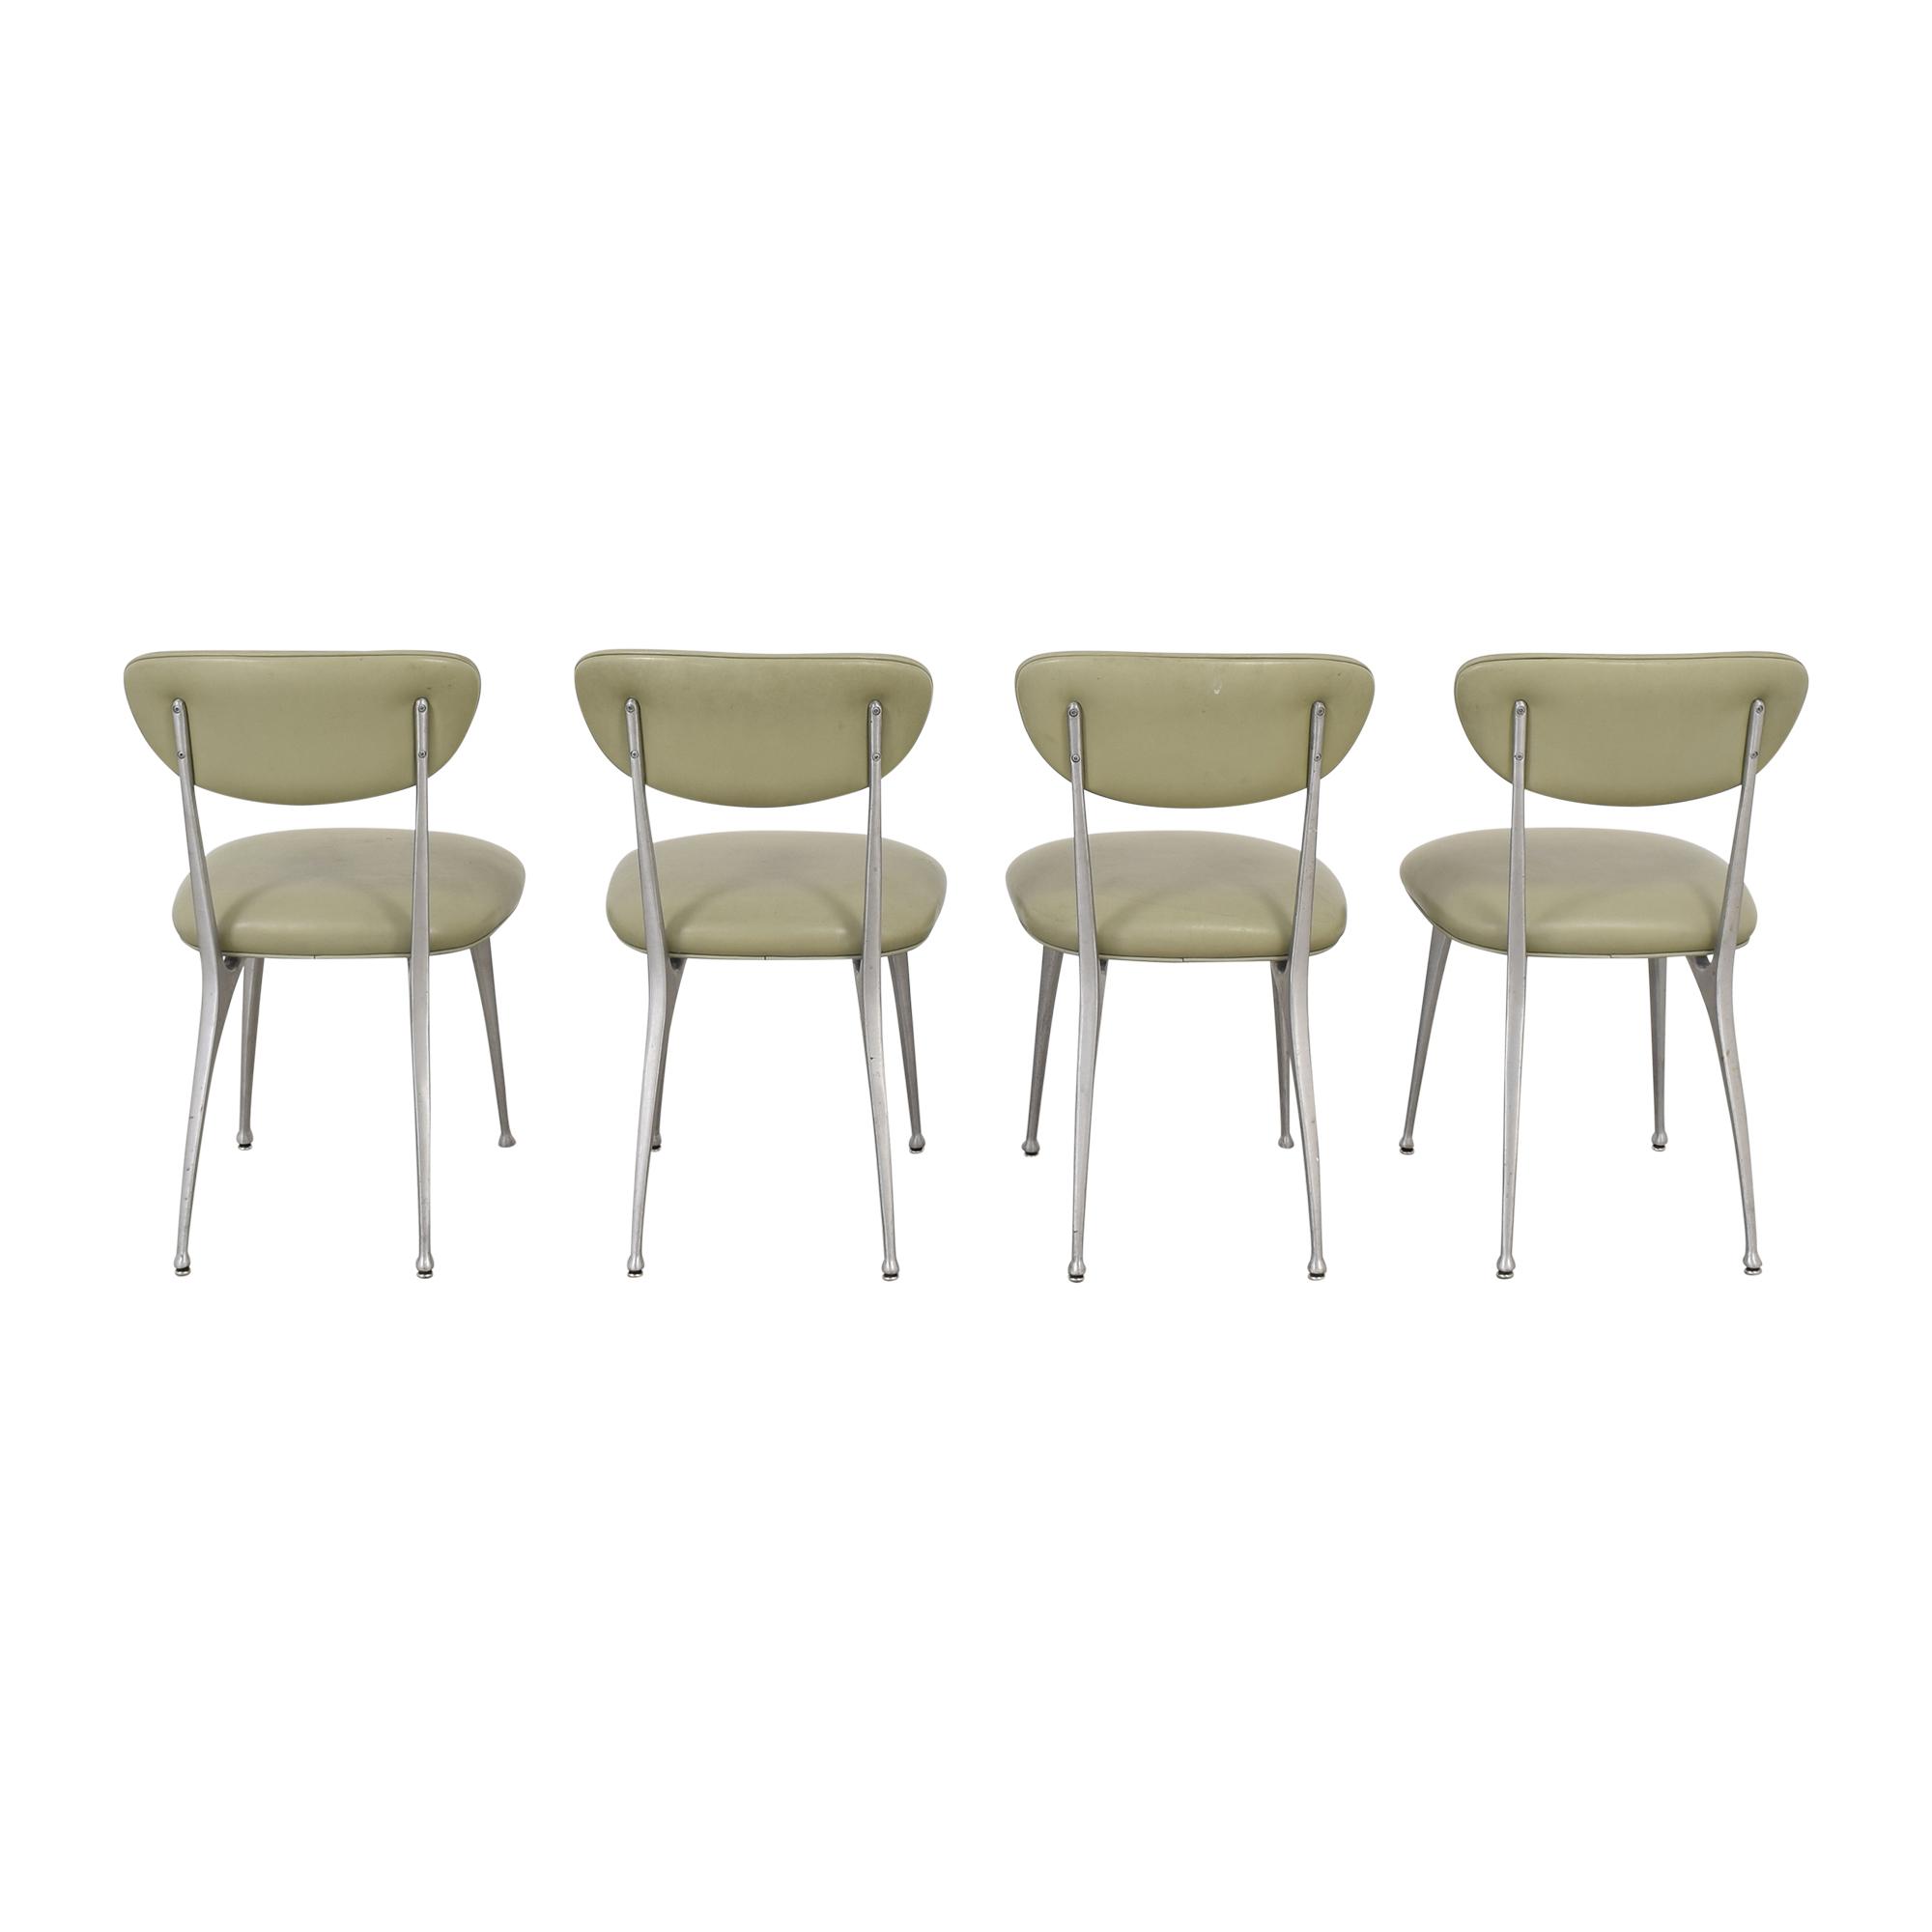 Modernica Modernica Vintage Dining Chairs light grey